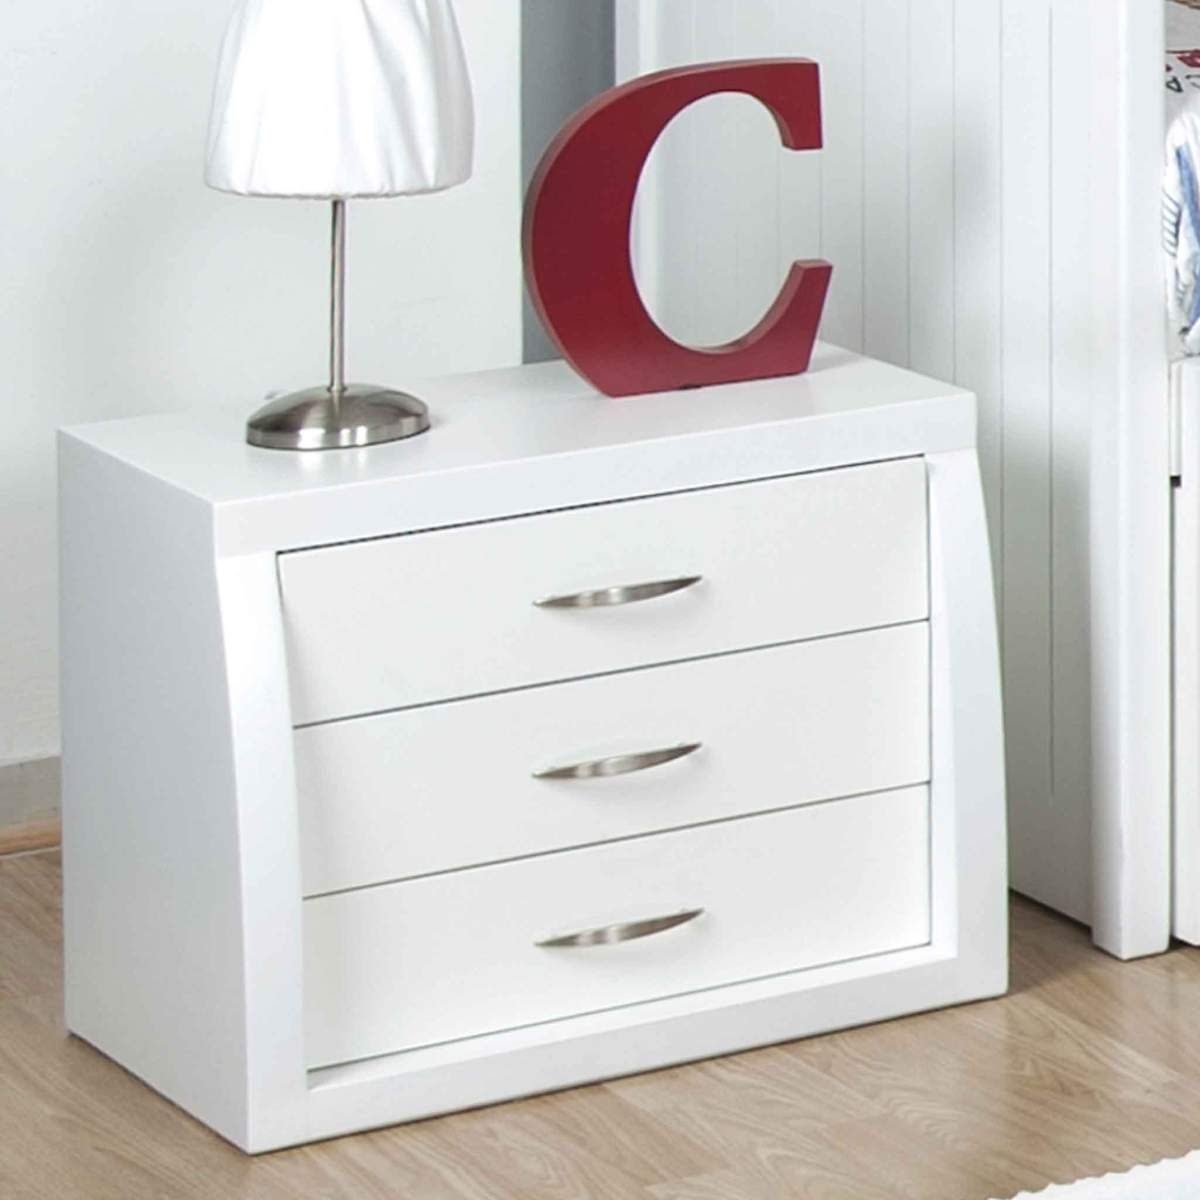 Restaurar o comprar mesas de noche para reformar tu casa